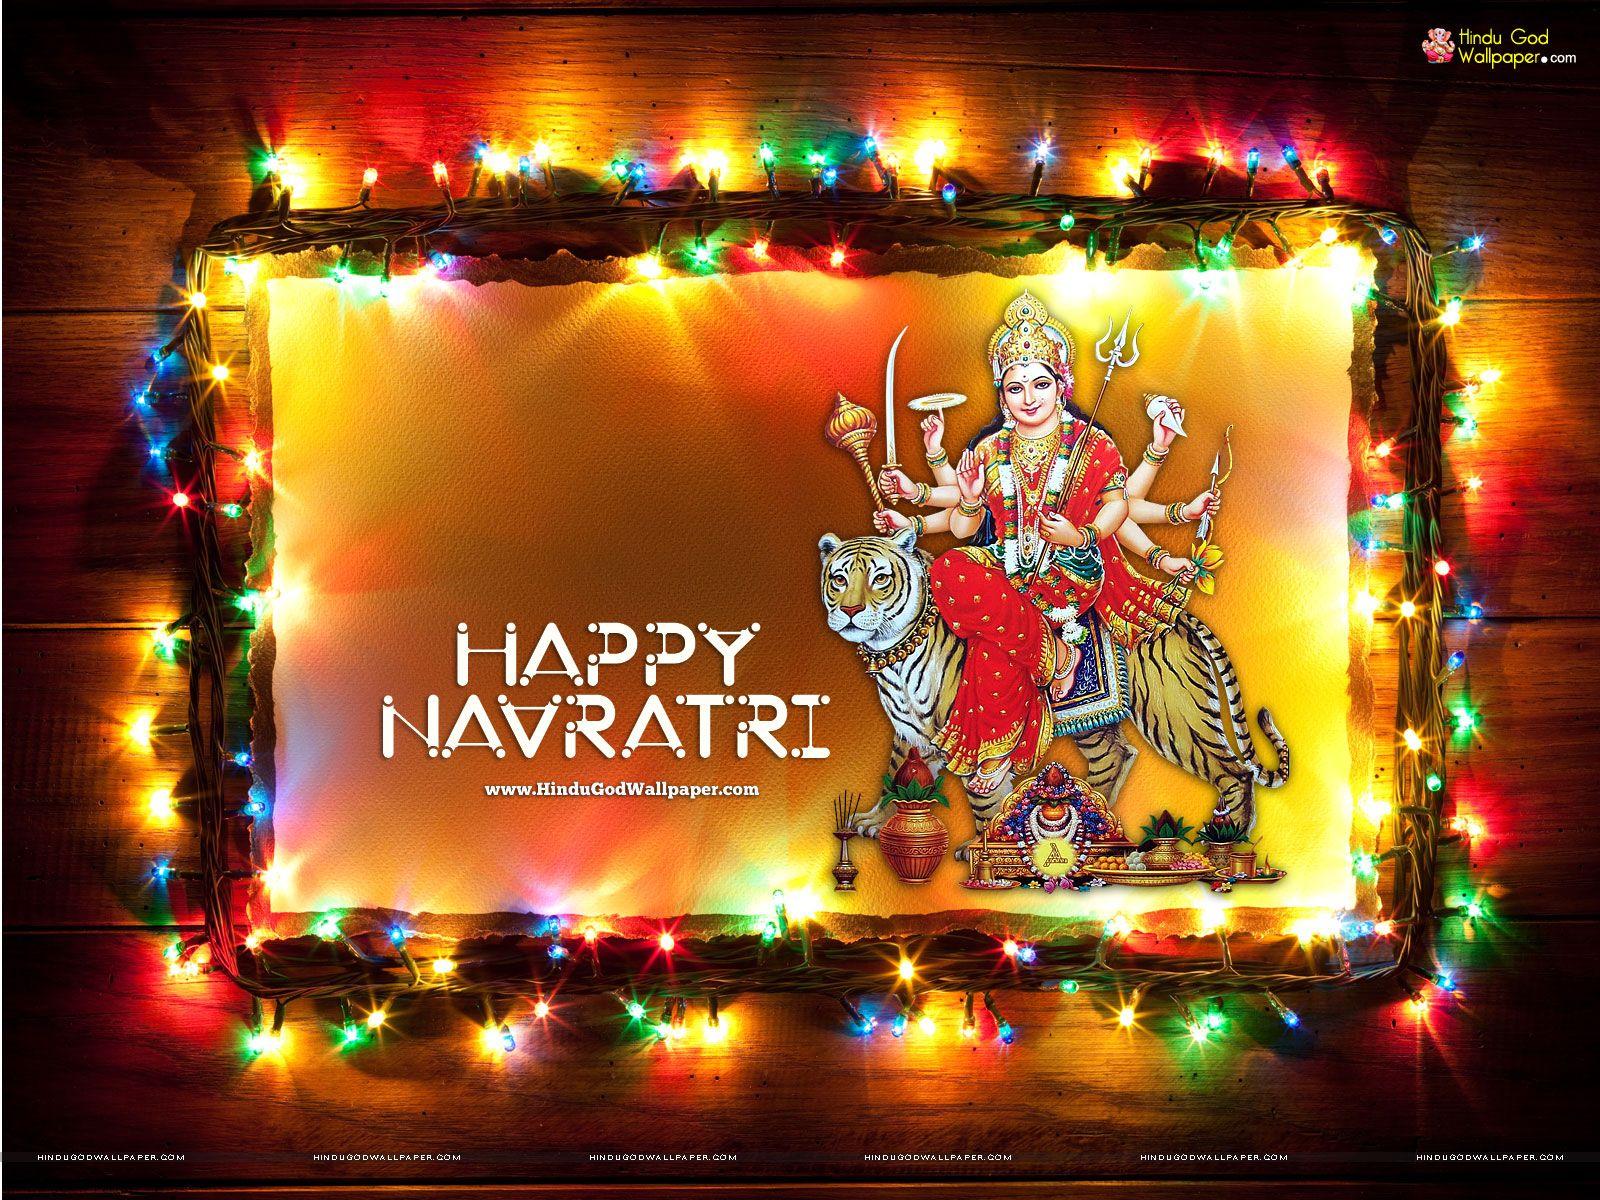 Wallpaper download navratri - Shubh Navratri Hd Wallpaper Free Download